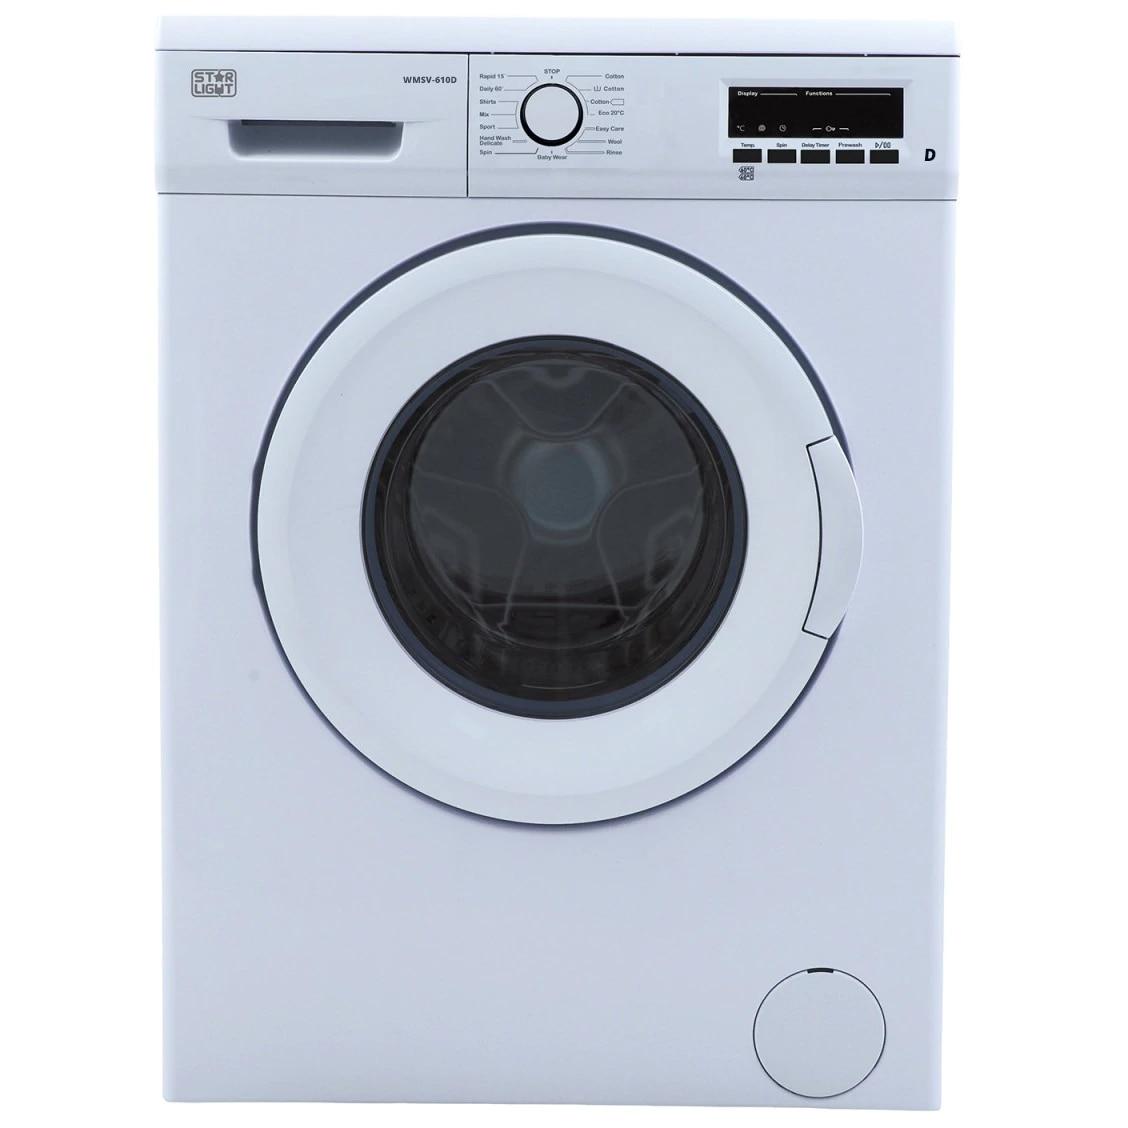 Fotografie Masina de spalat rufe SLIM Star-Light WMSV-610D, 6 kg, 1000 RPM, Clasa D, Display LED, Alb